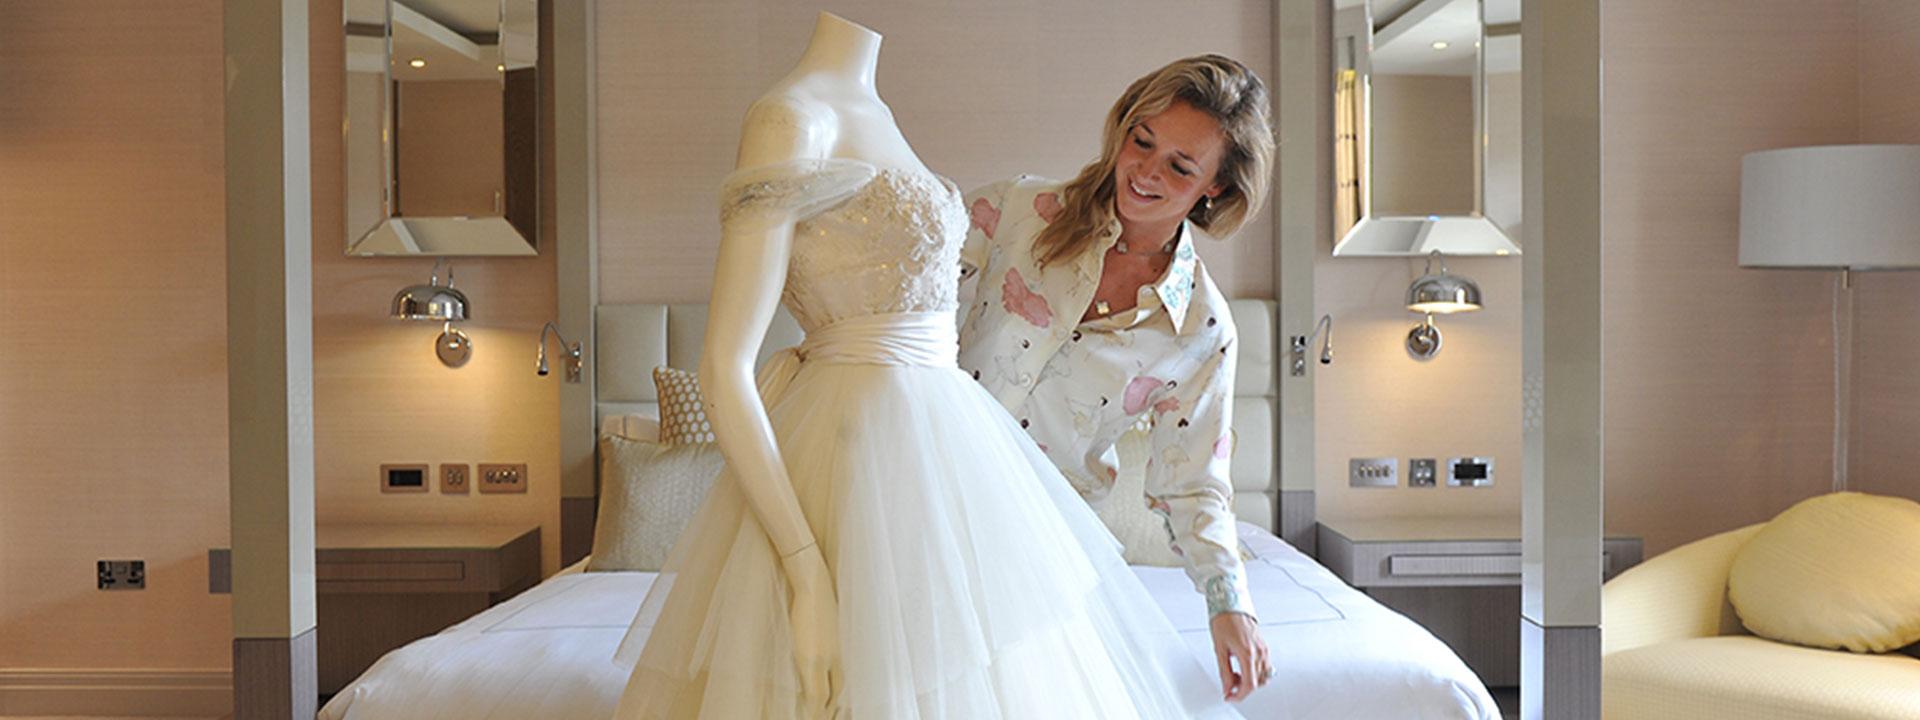 The Berkeley brides Philipa